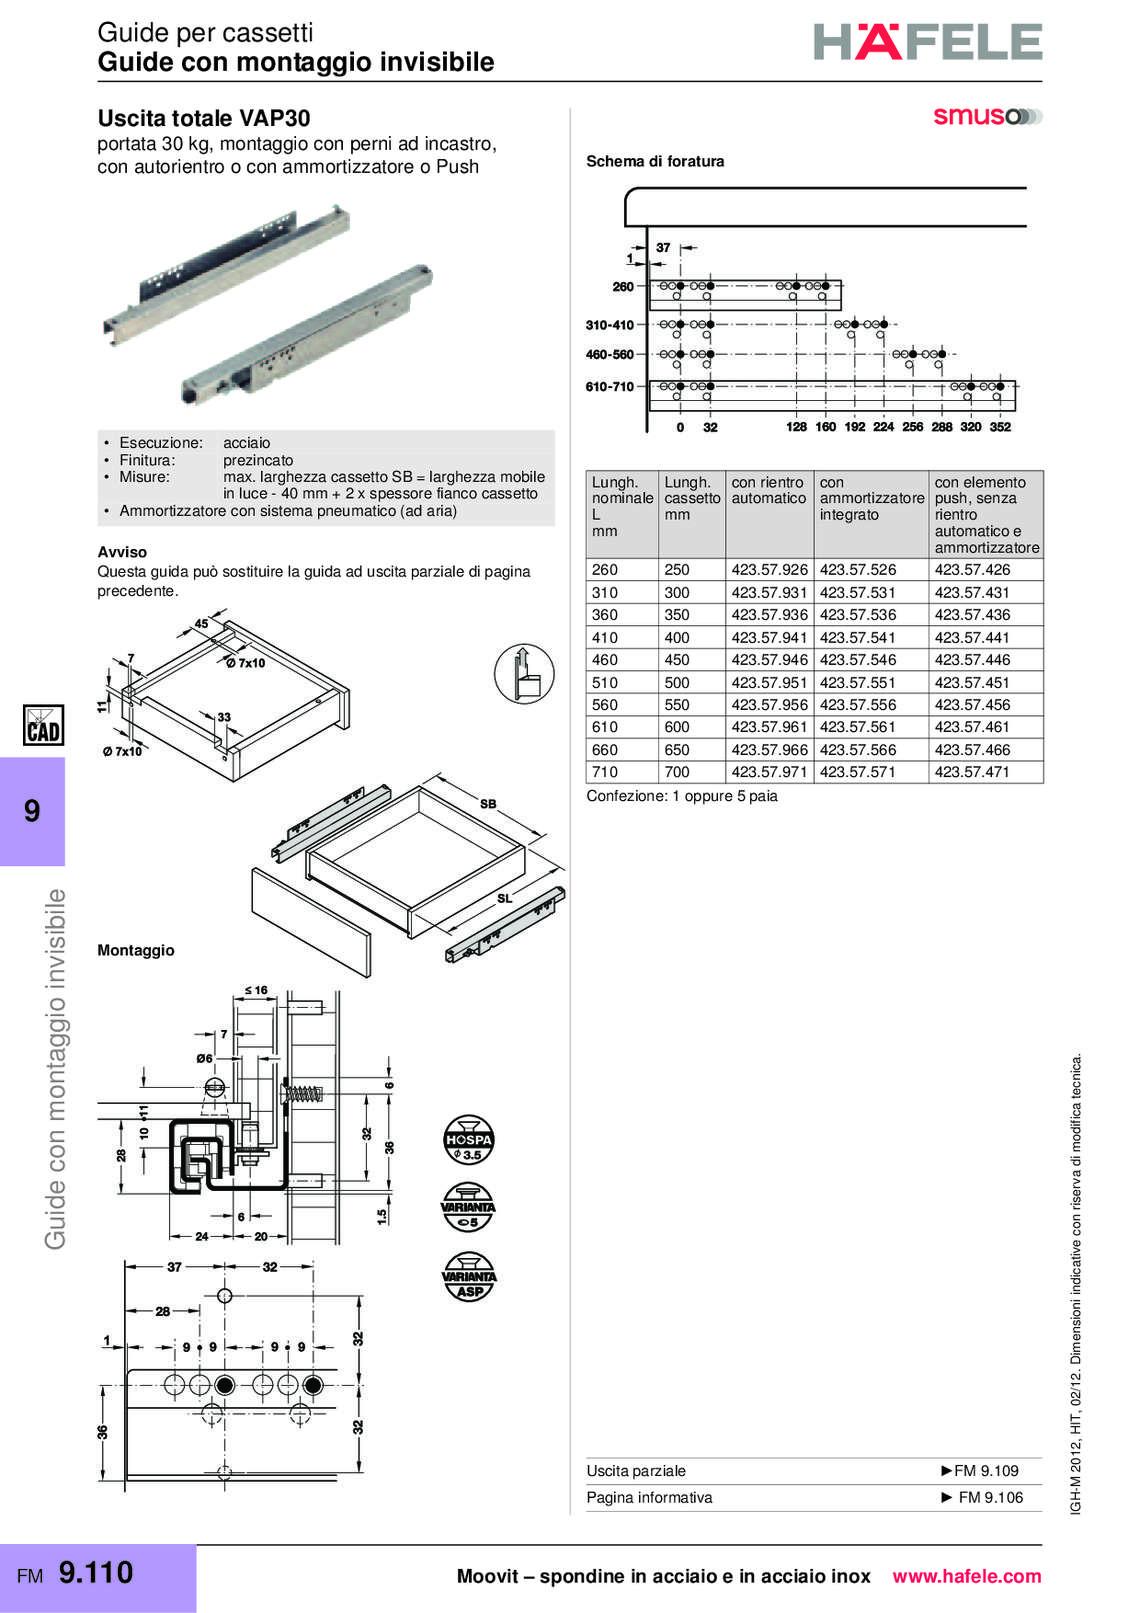 hafele-spondine-e-guide-per-mobili_40_157.jpg